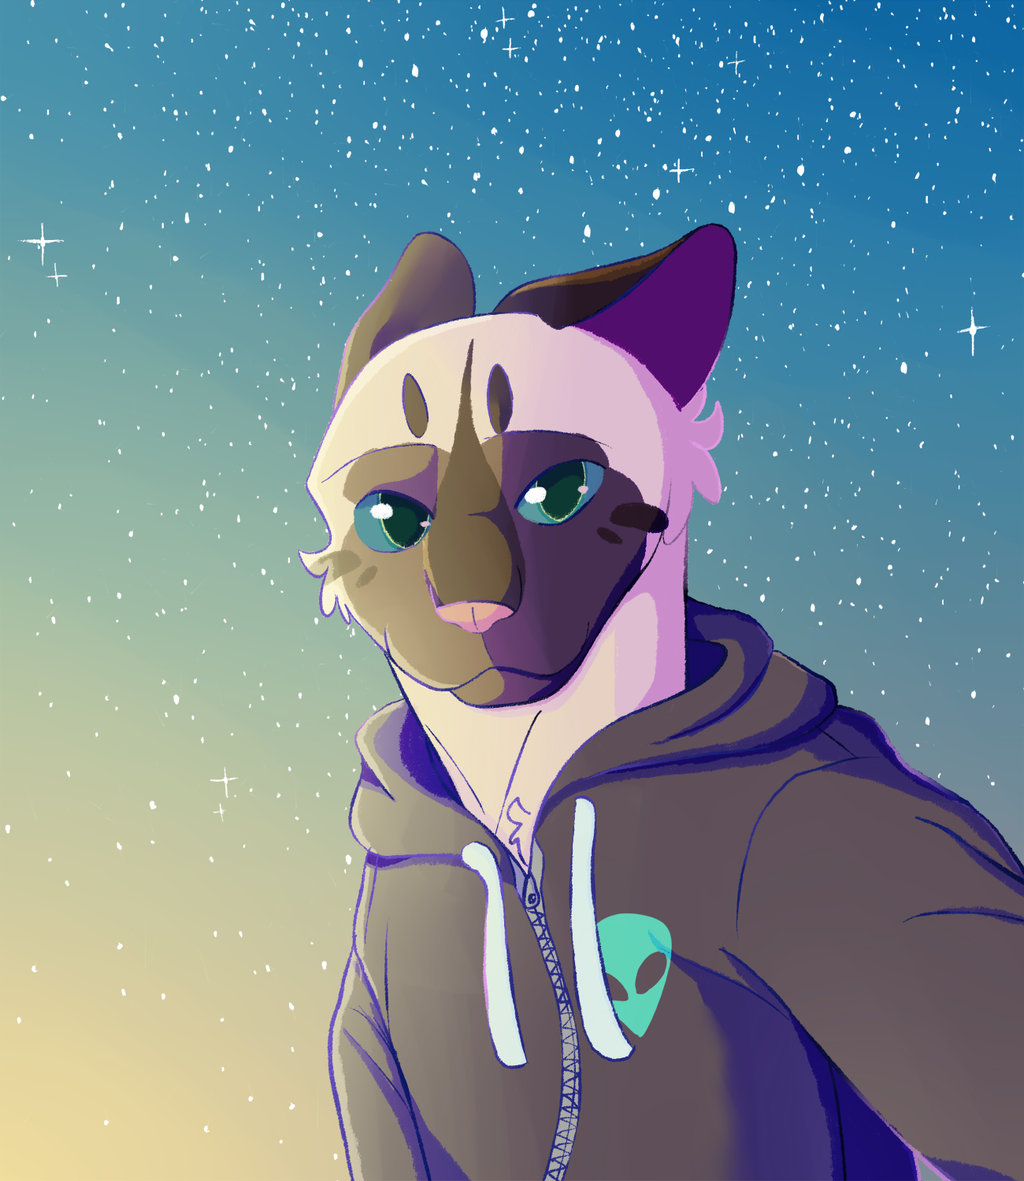 Most recent image: Starboy